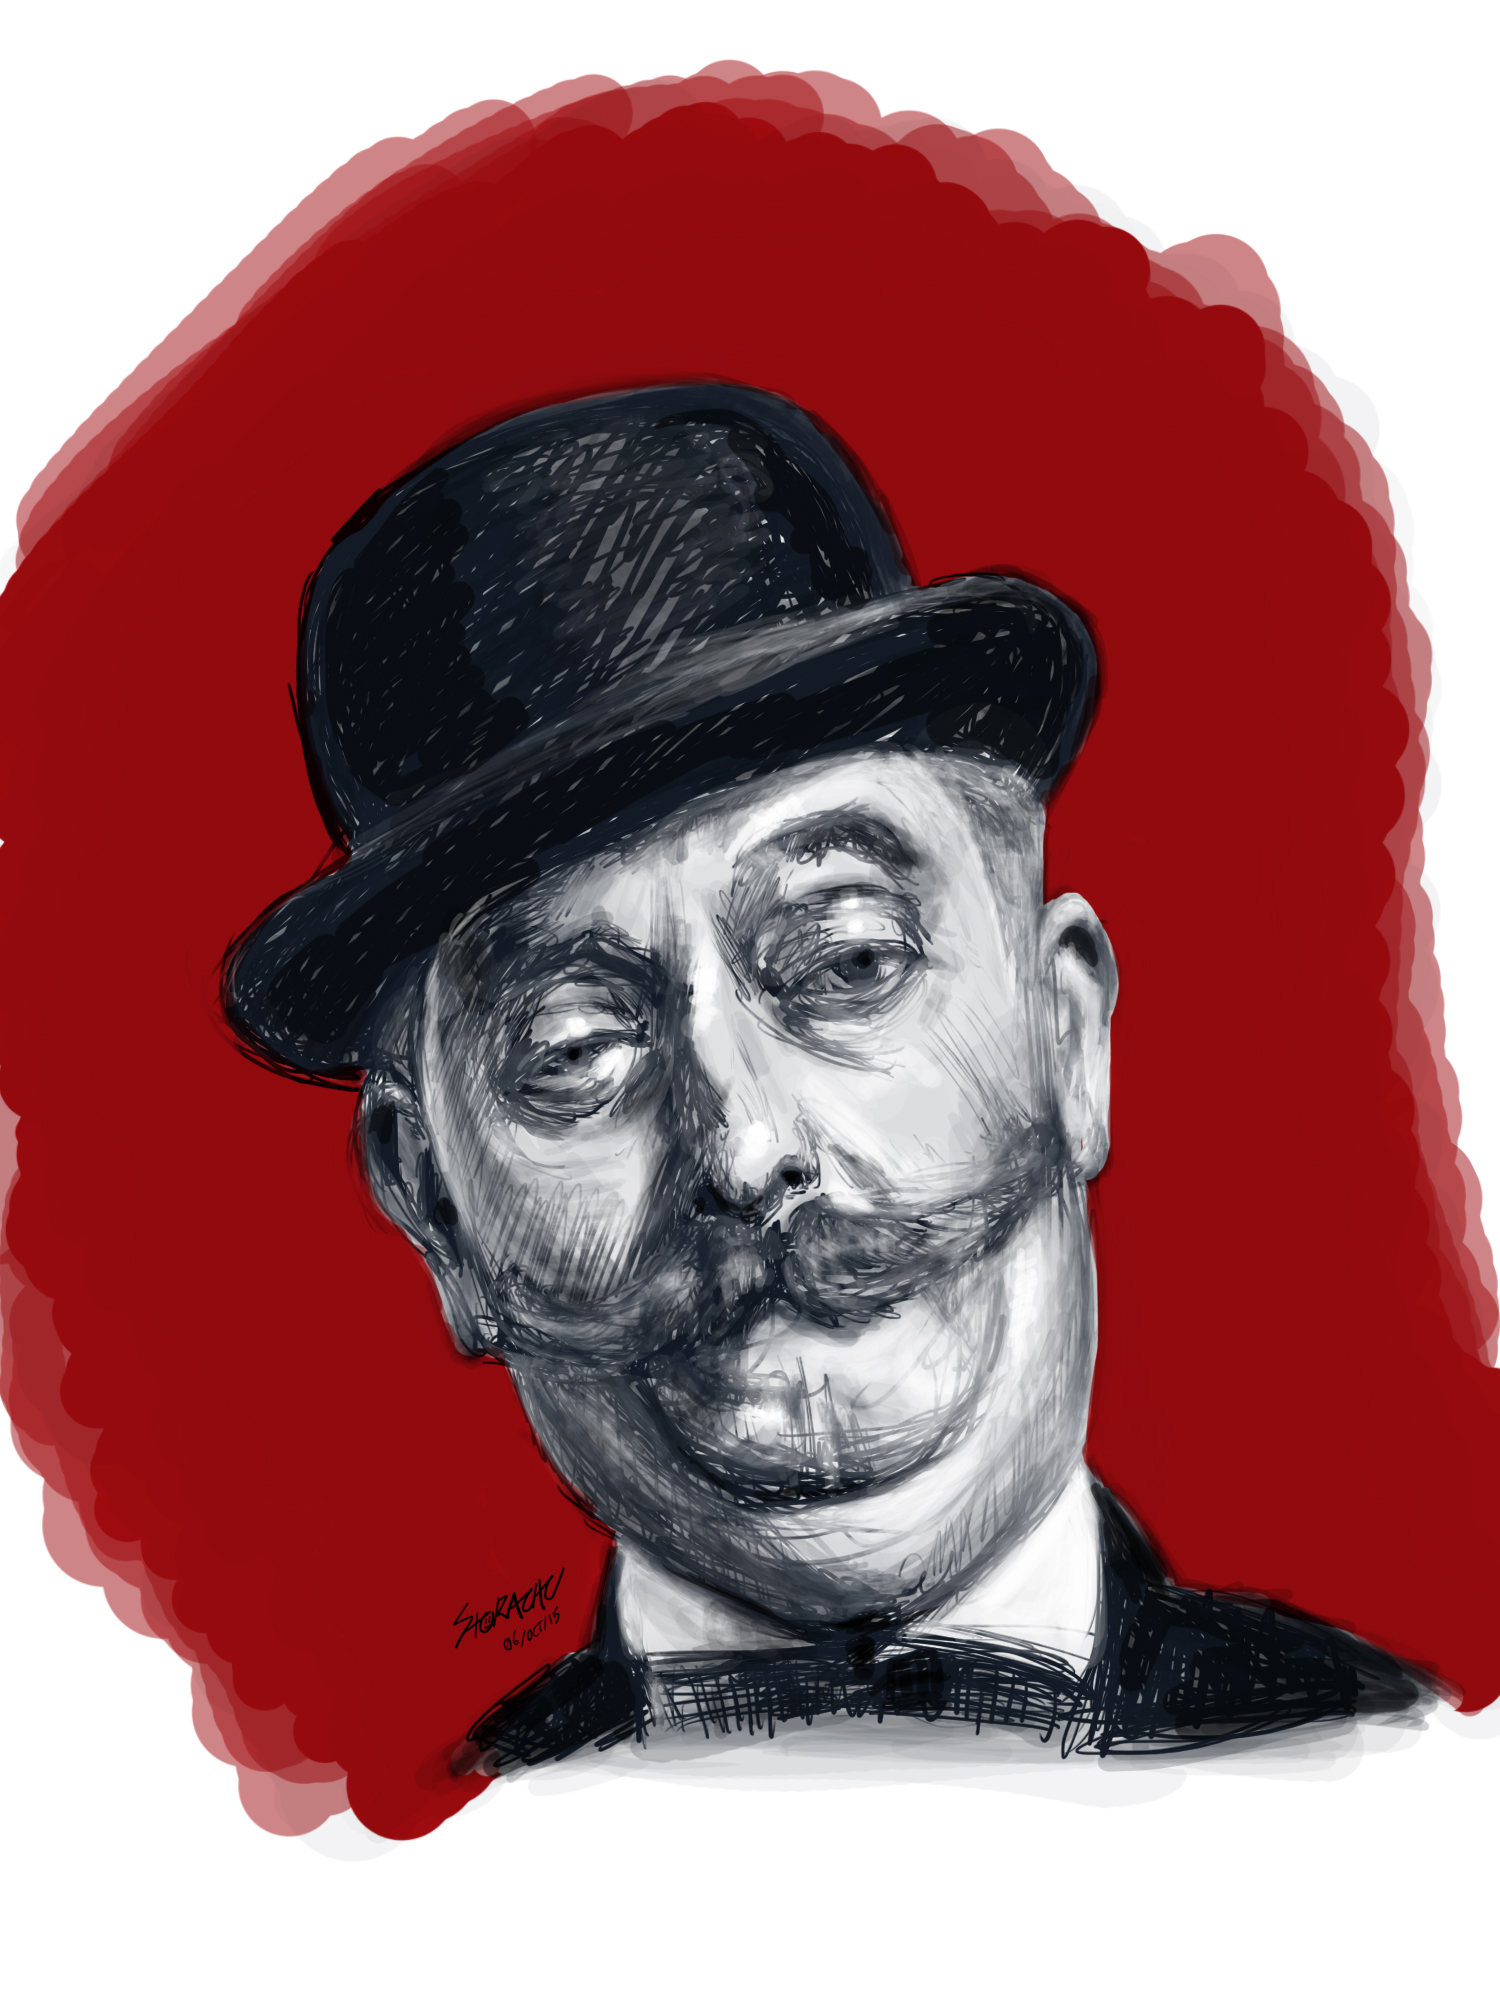 Bowler Hat Man 1st study - realistic